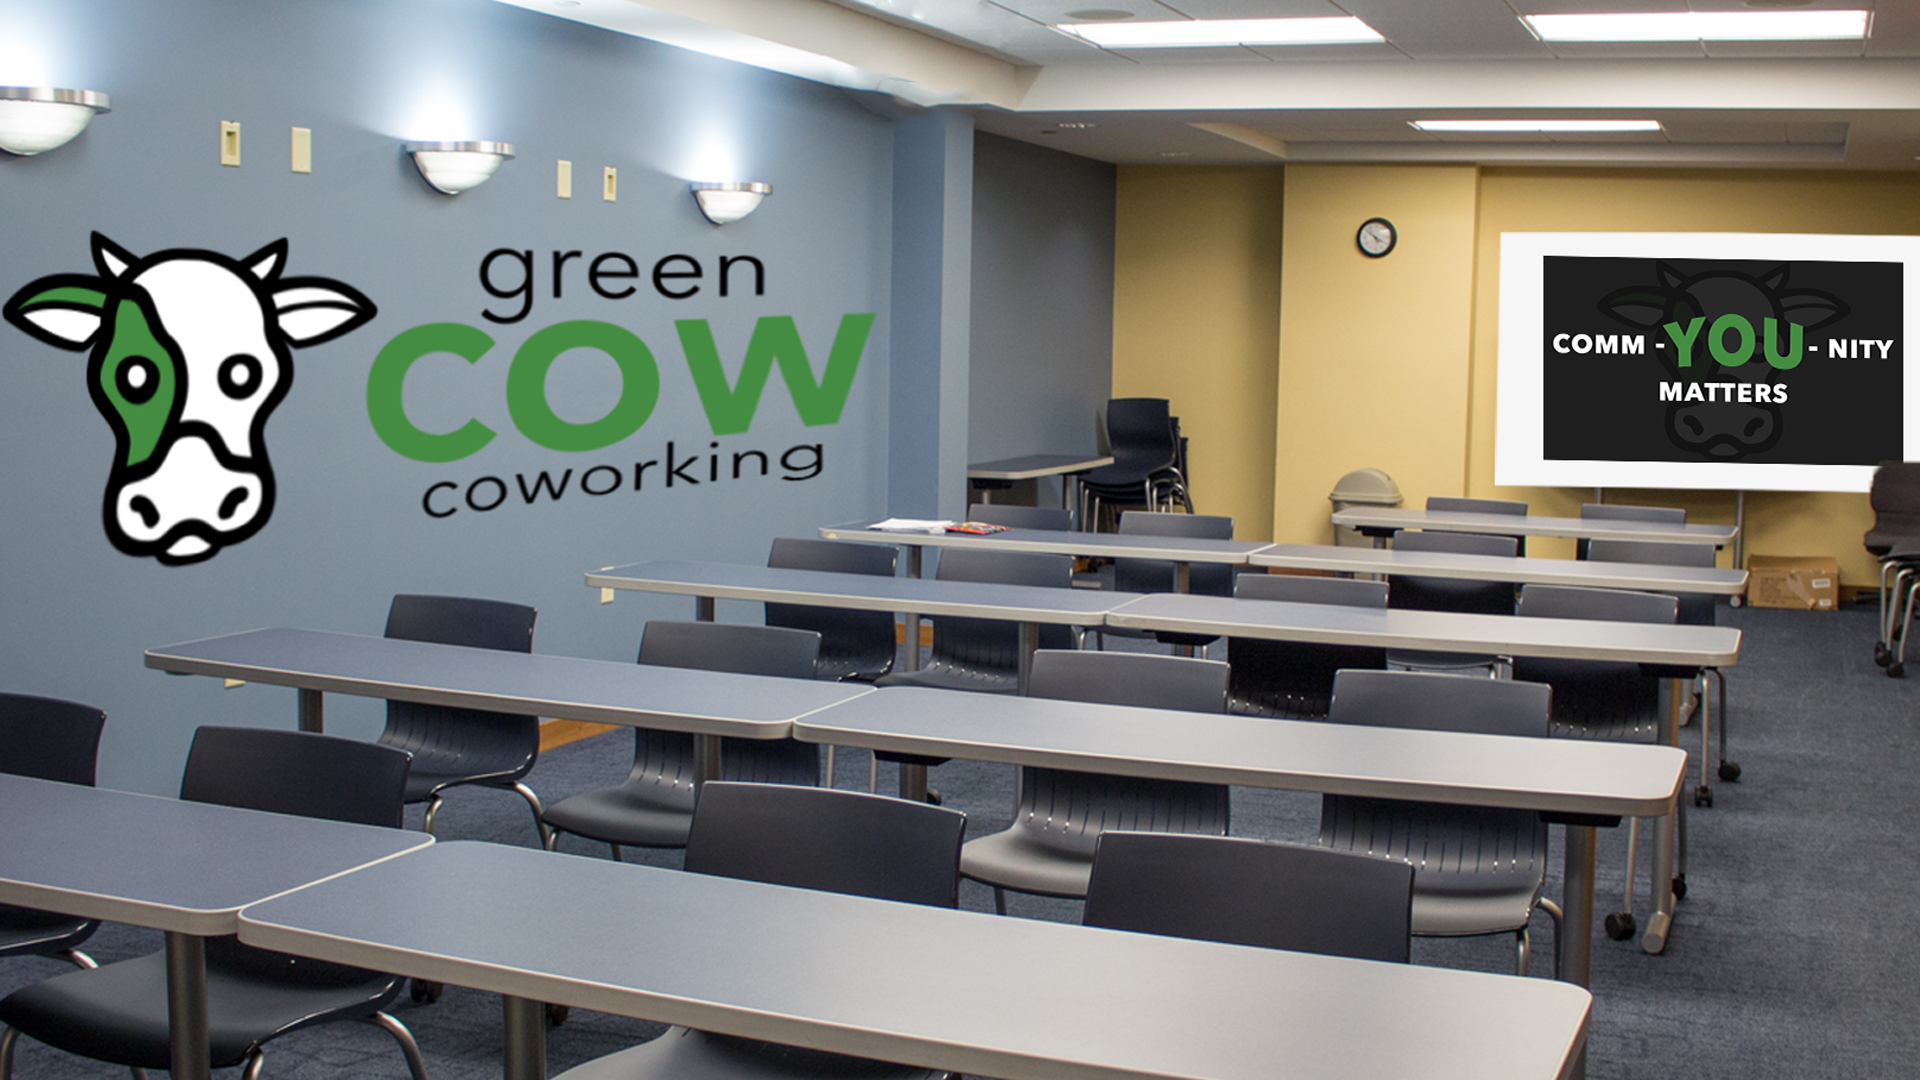 greenCOW Coworking, Hammond